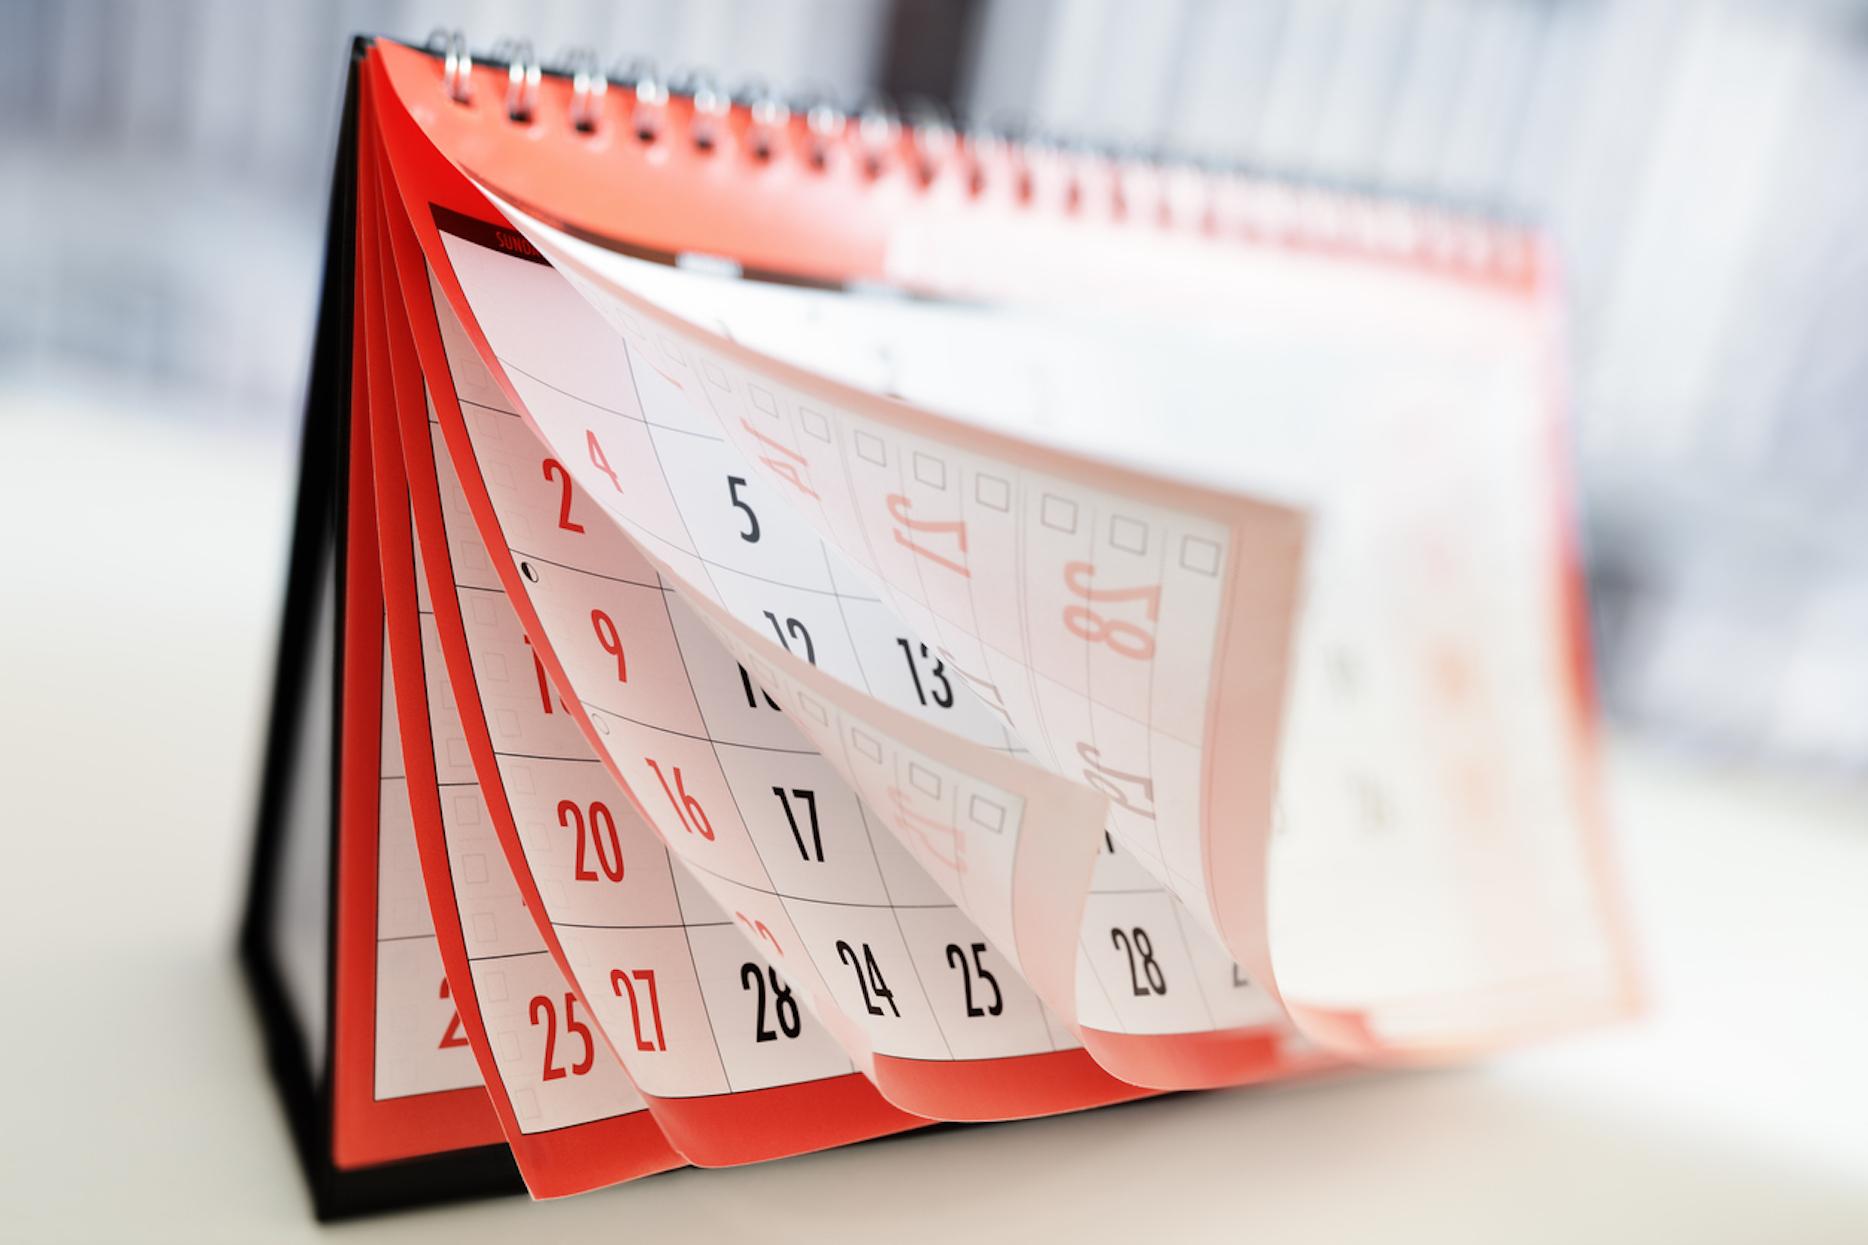 Agenda desconcerts, expos et spectacles2018-2019